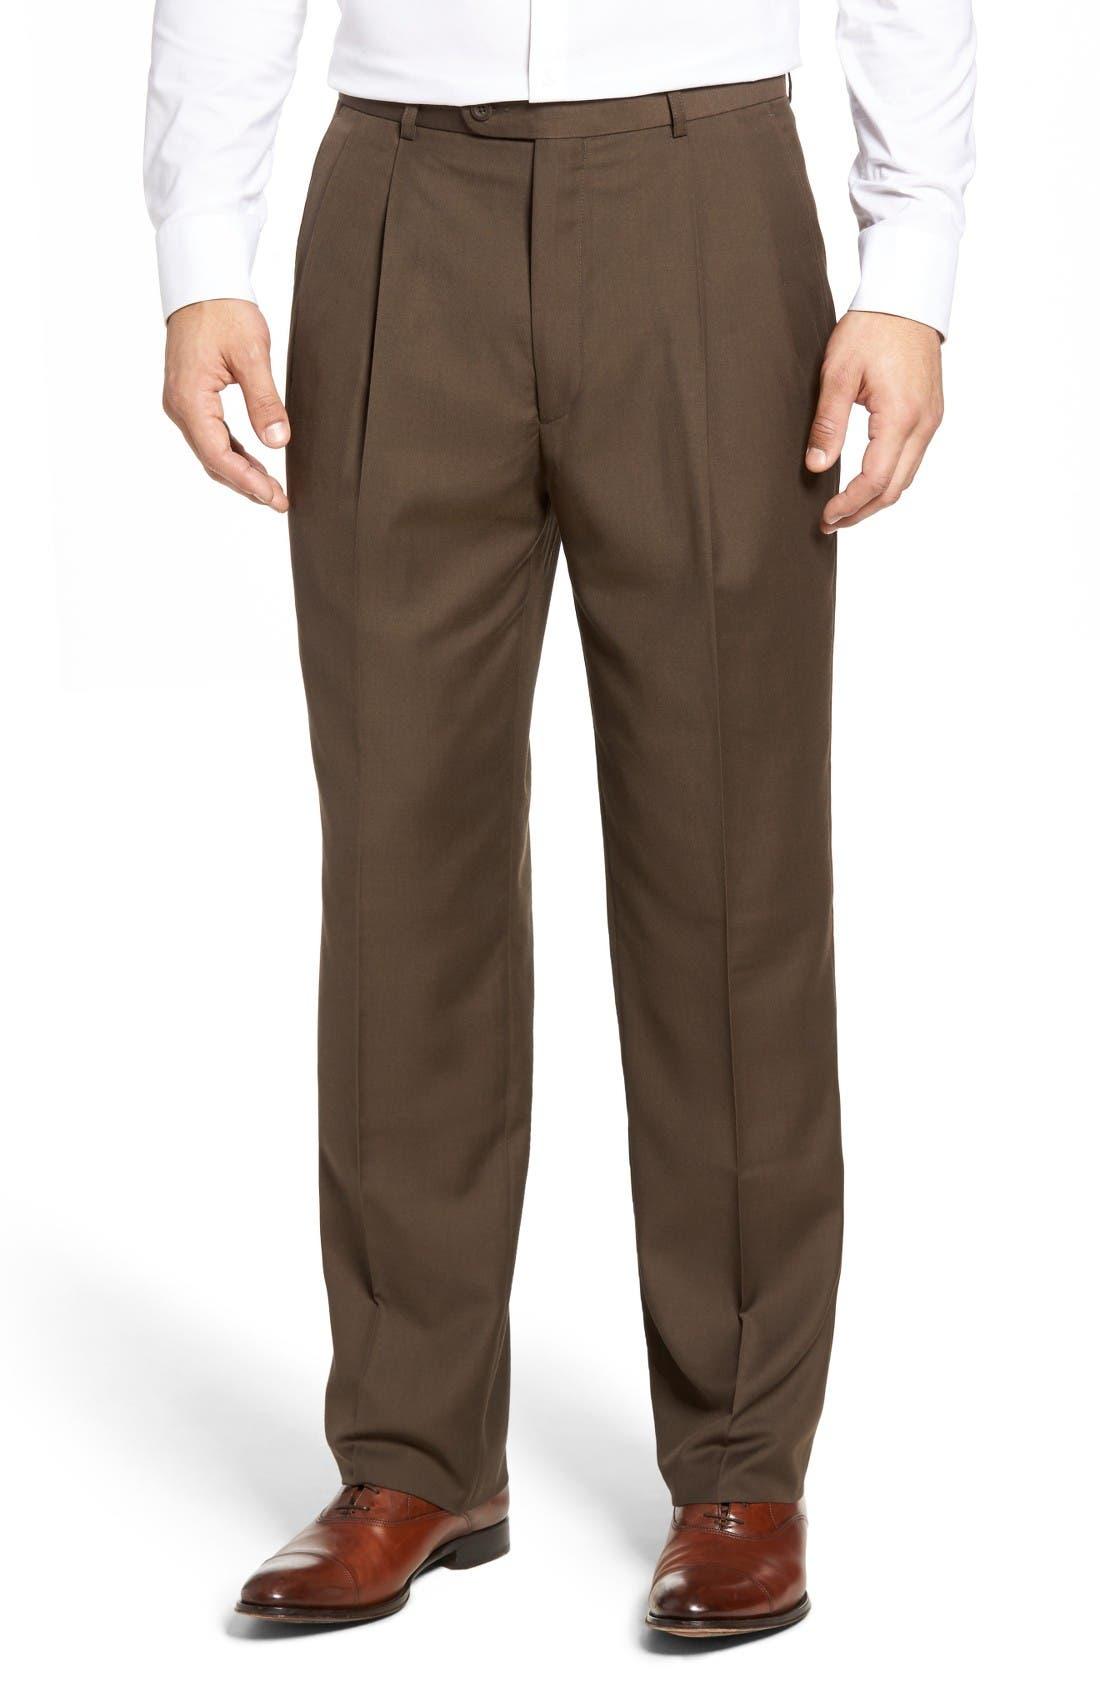 Linea Naturale Pleated Microfiber Dress Pants